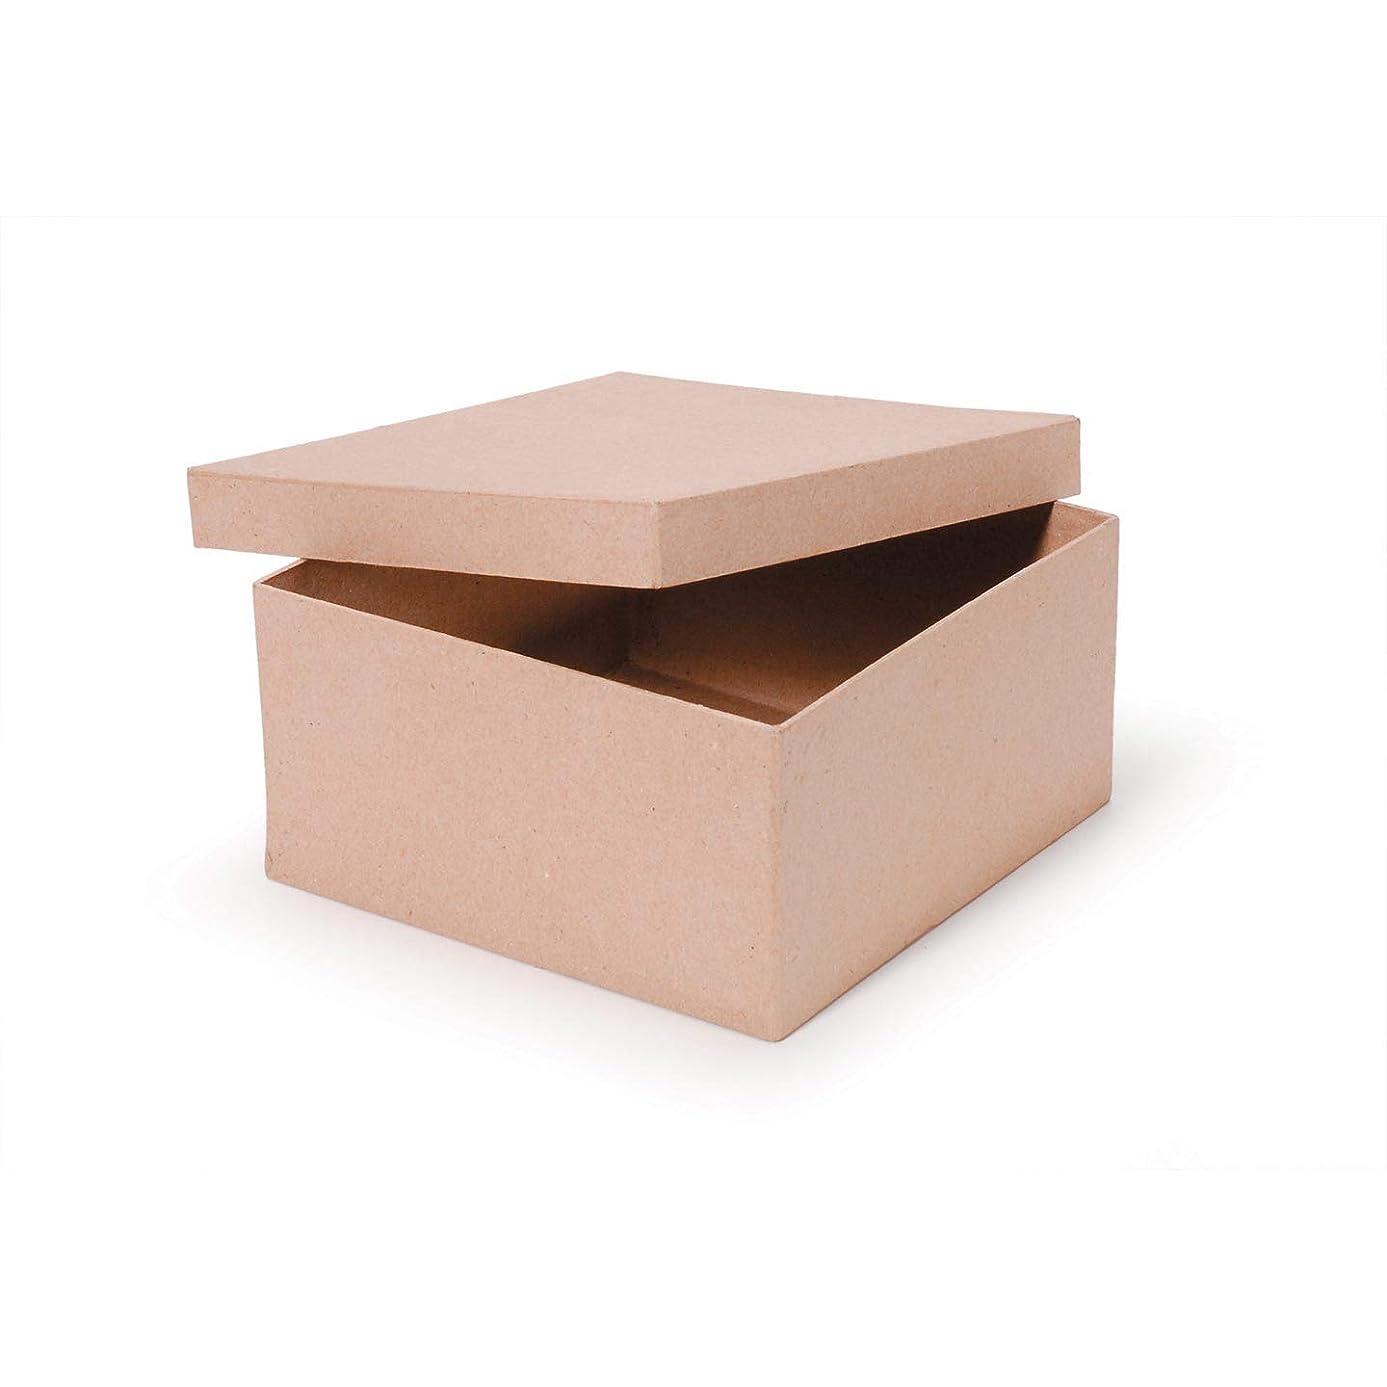 Bulk Buy: Darice DIY Crafts Paper Mache Box Square 8 x 8 x 4 inches (2-Pack) 2805-41FCAS